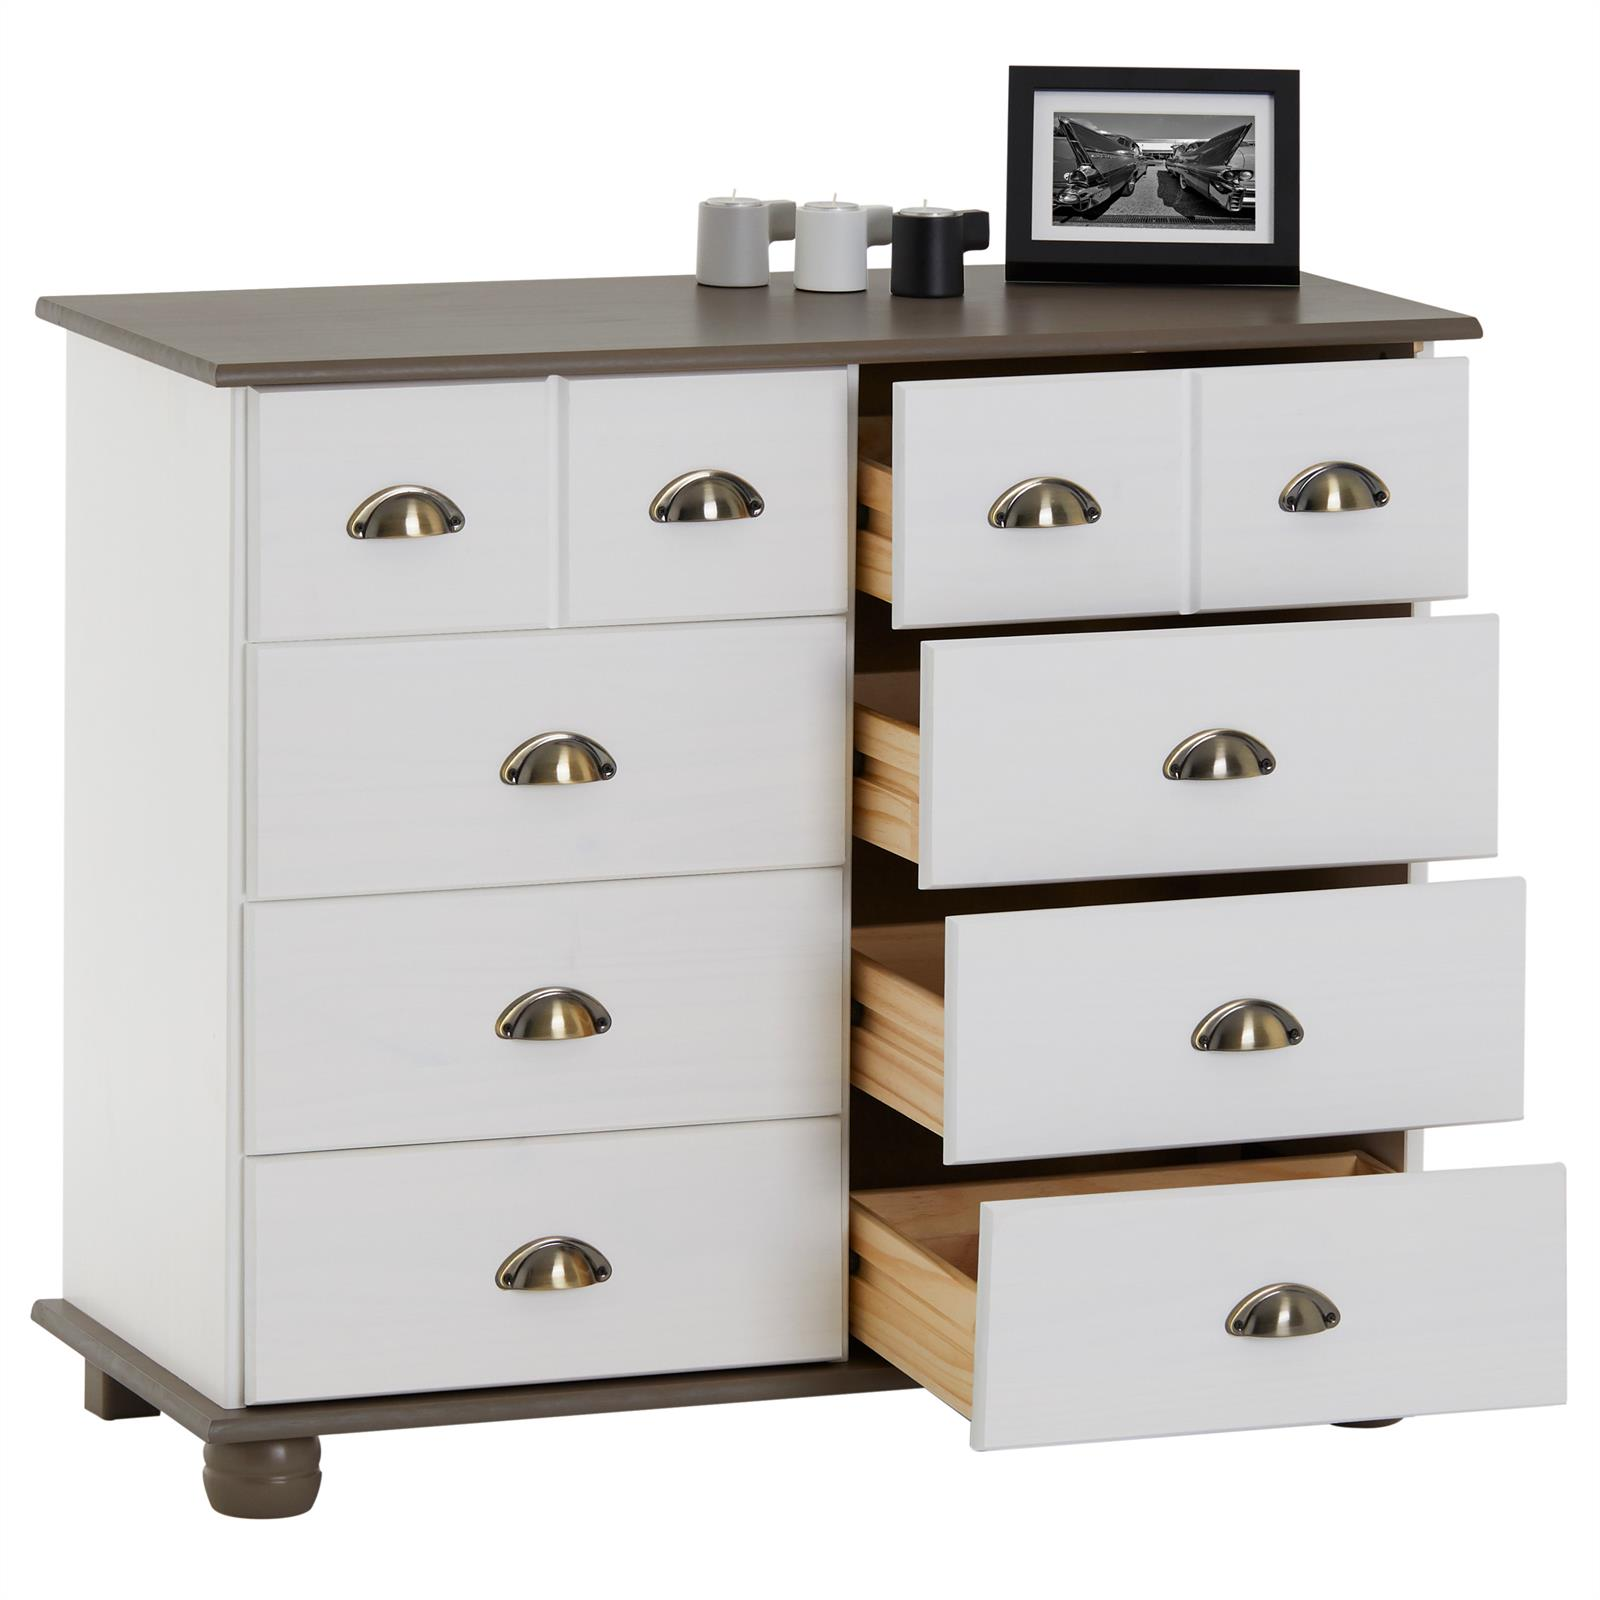 apothekerkommode kommode apothekerschrank sideboard mit 8. Black Bedroom Furniture Sets. Home Design Ideas